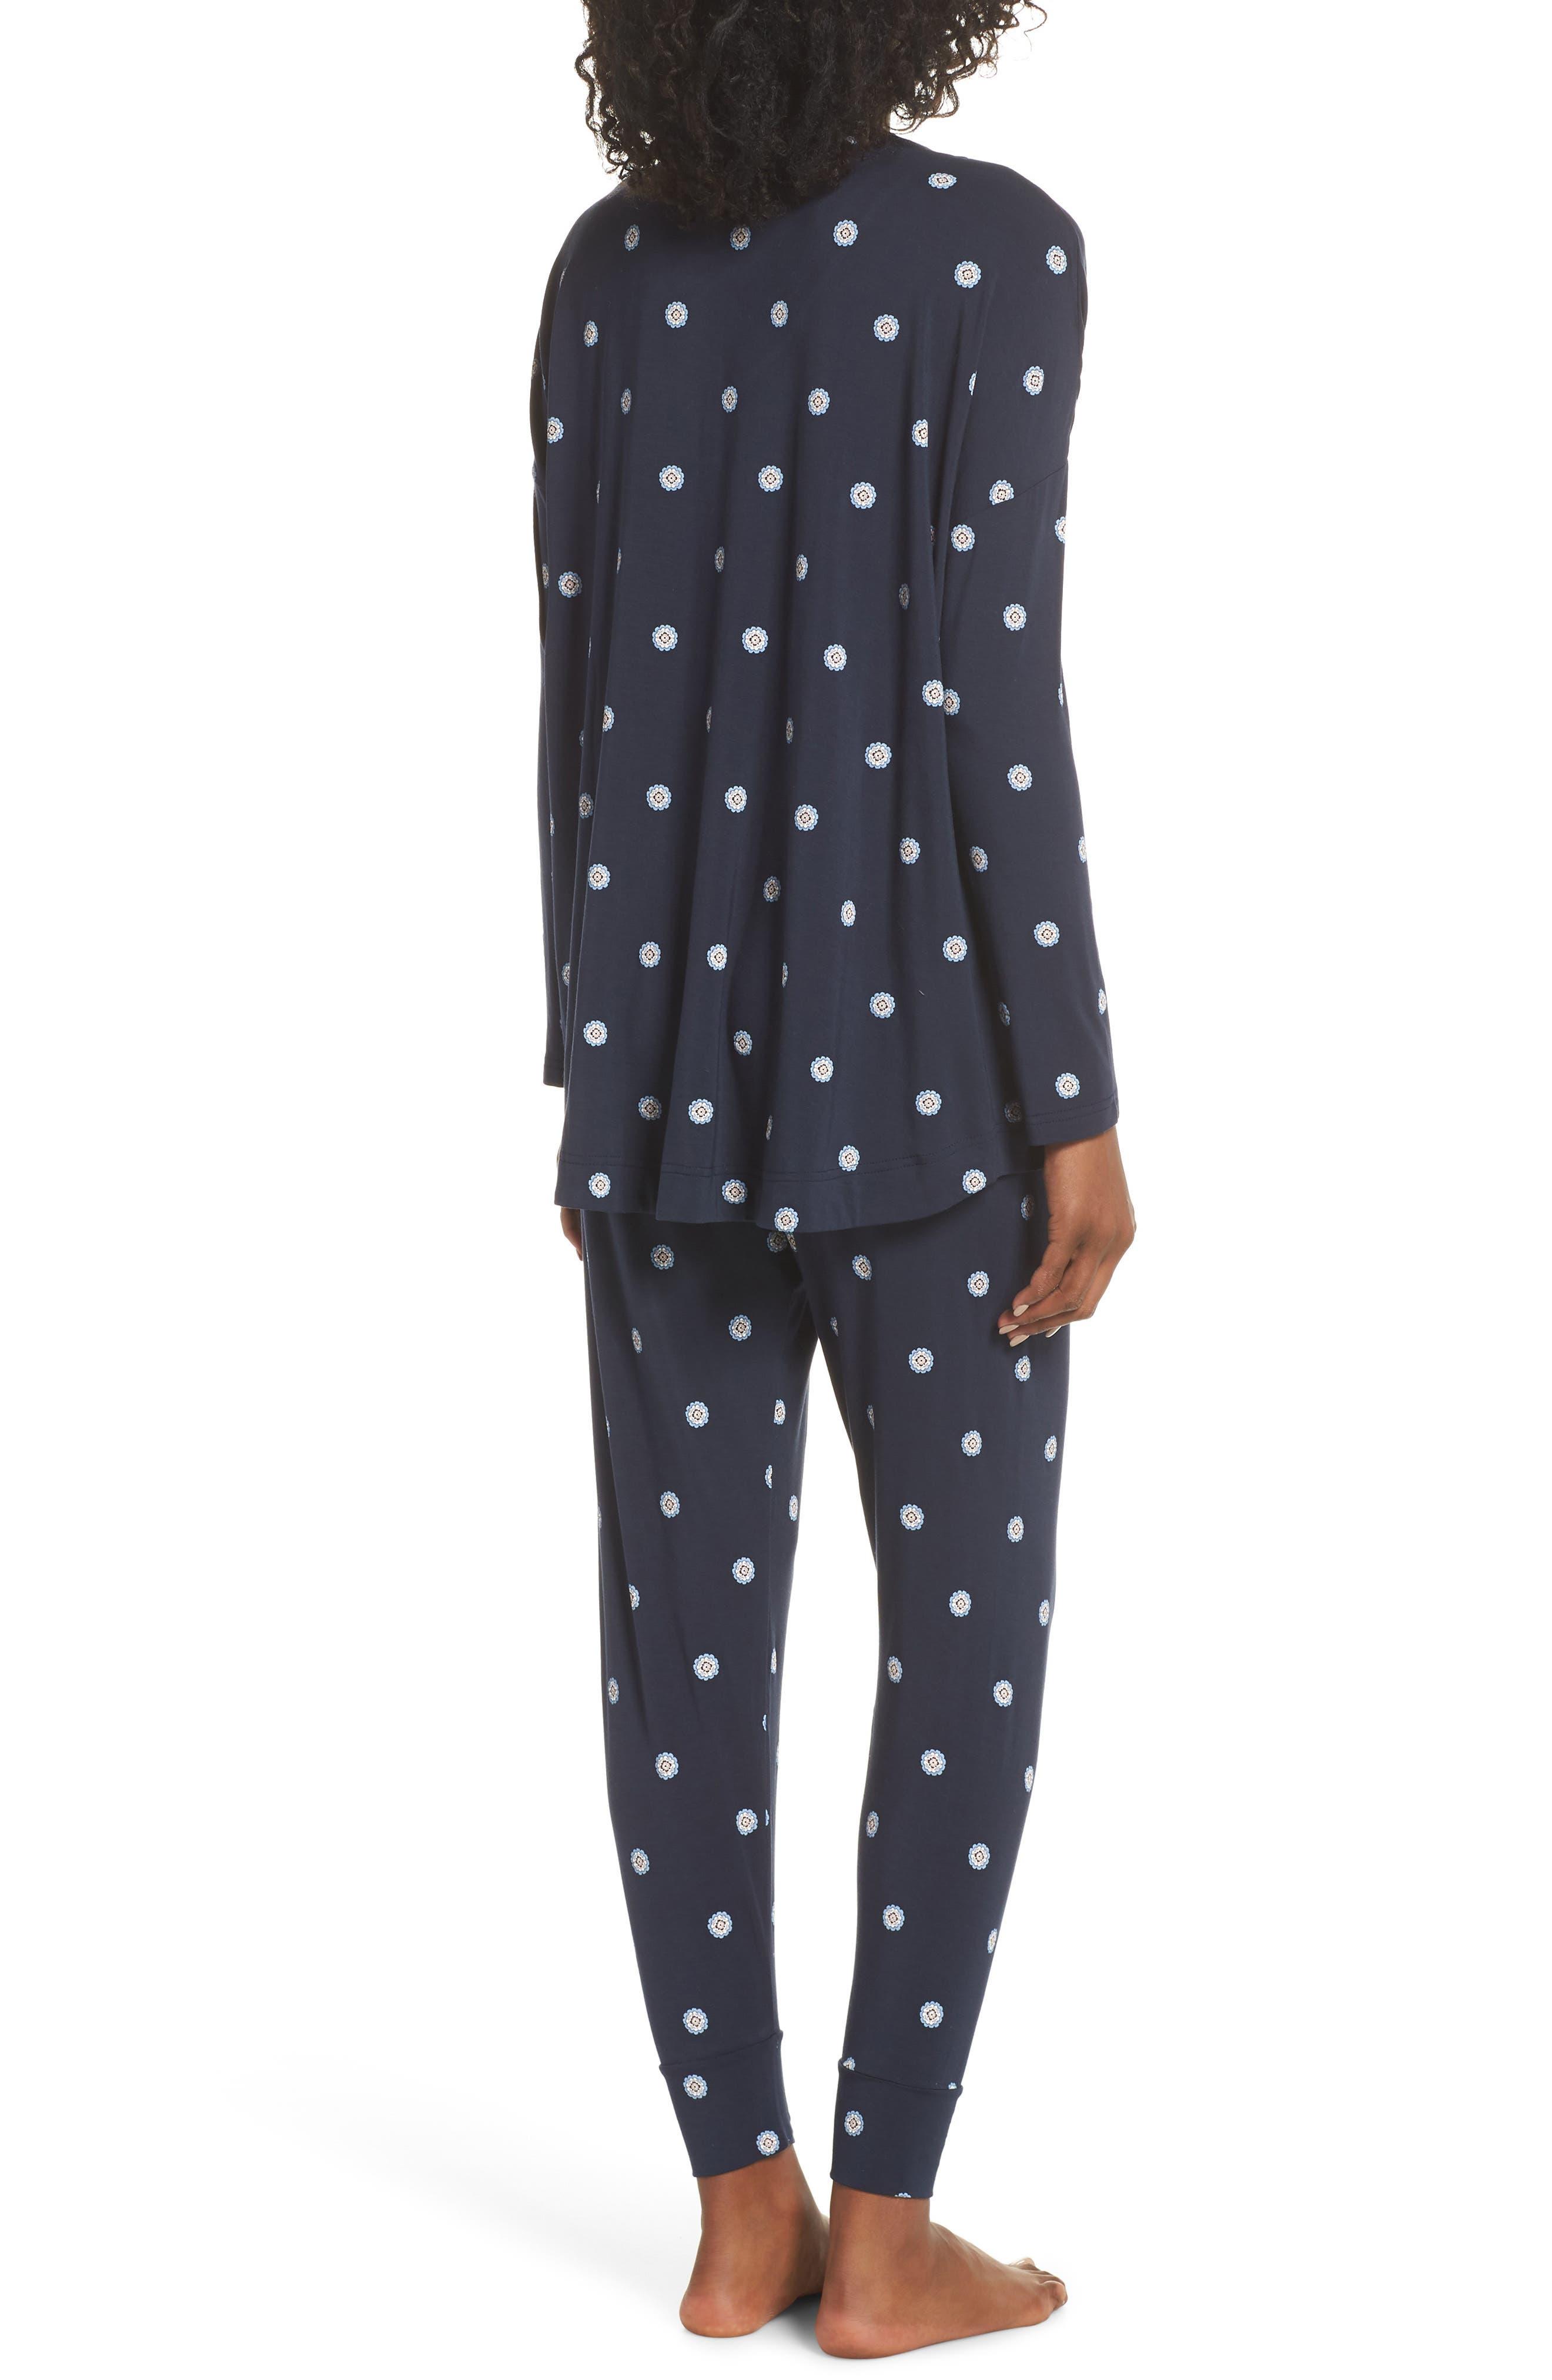 6c5e0e96a310 Nordstrom Women s Pajama Sets Lingerie   Sleepwear